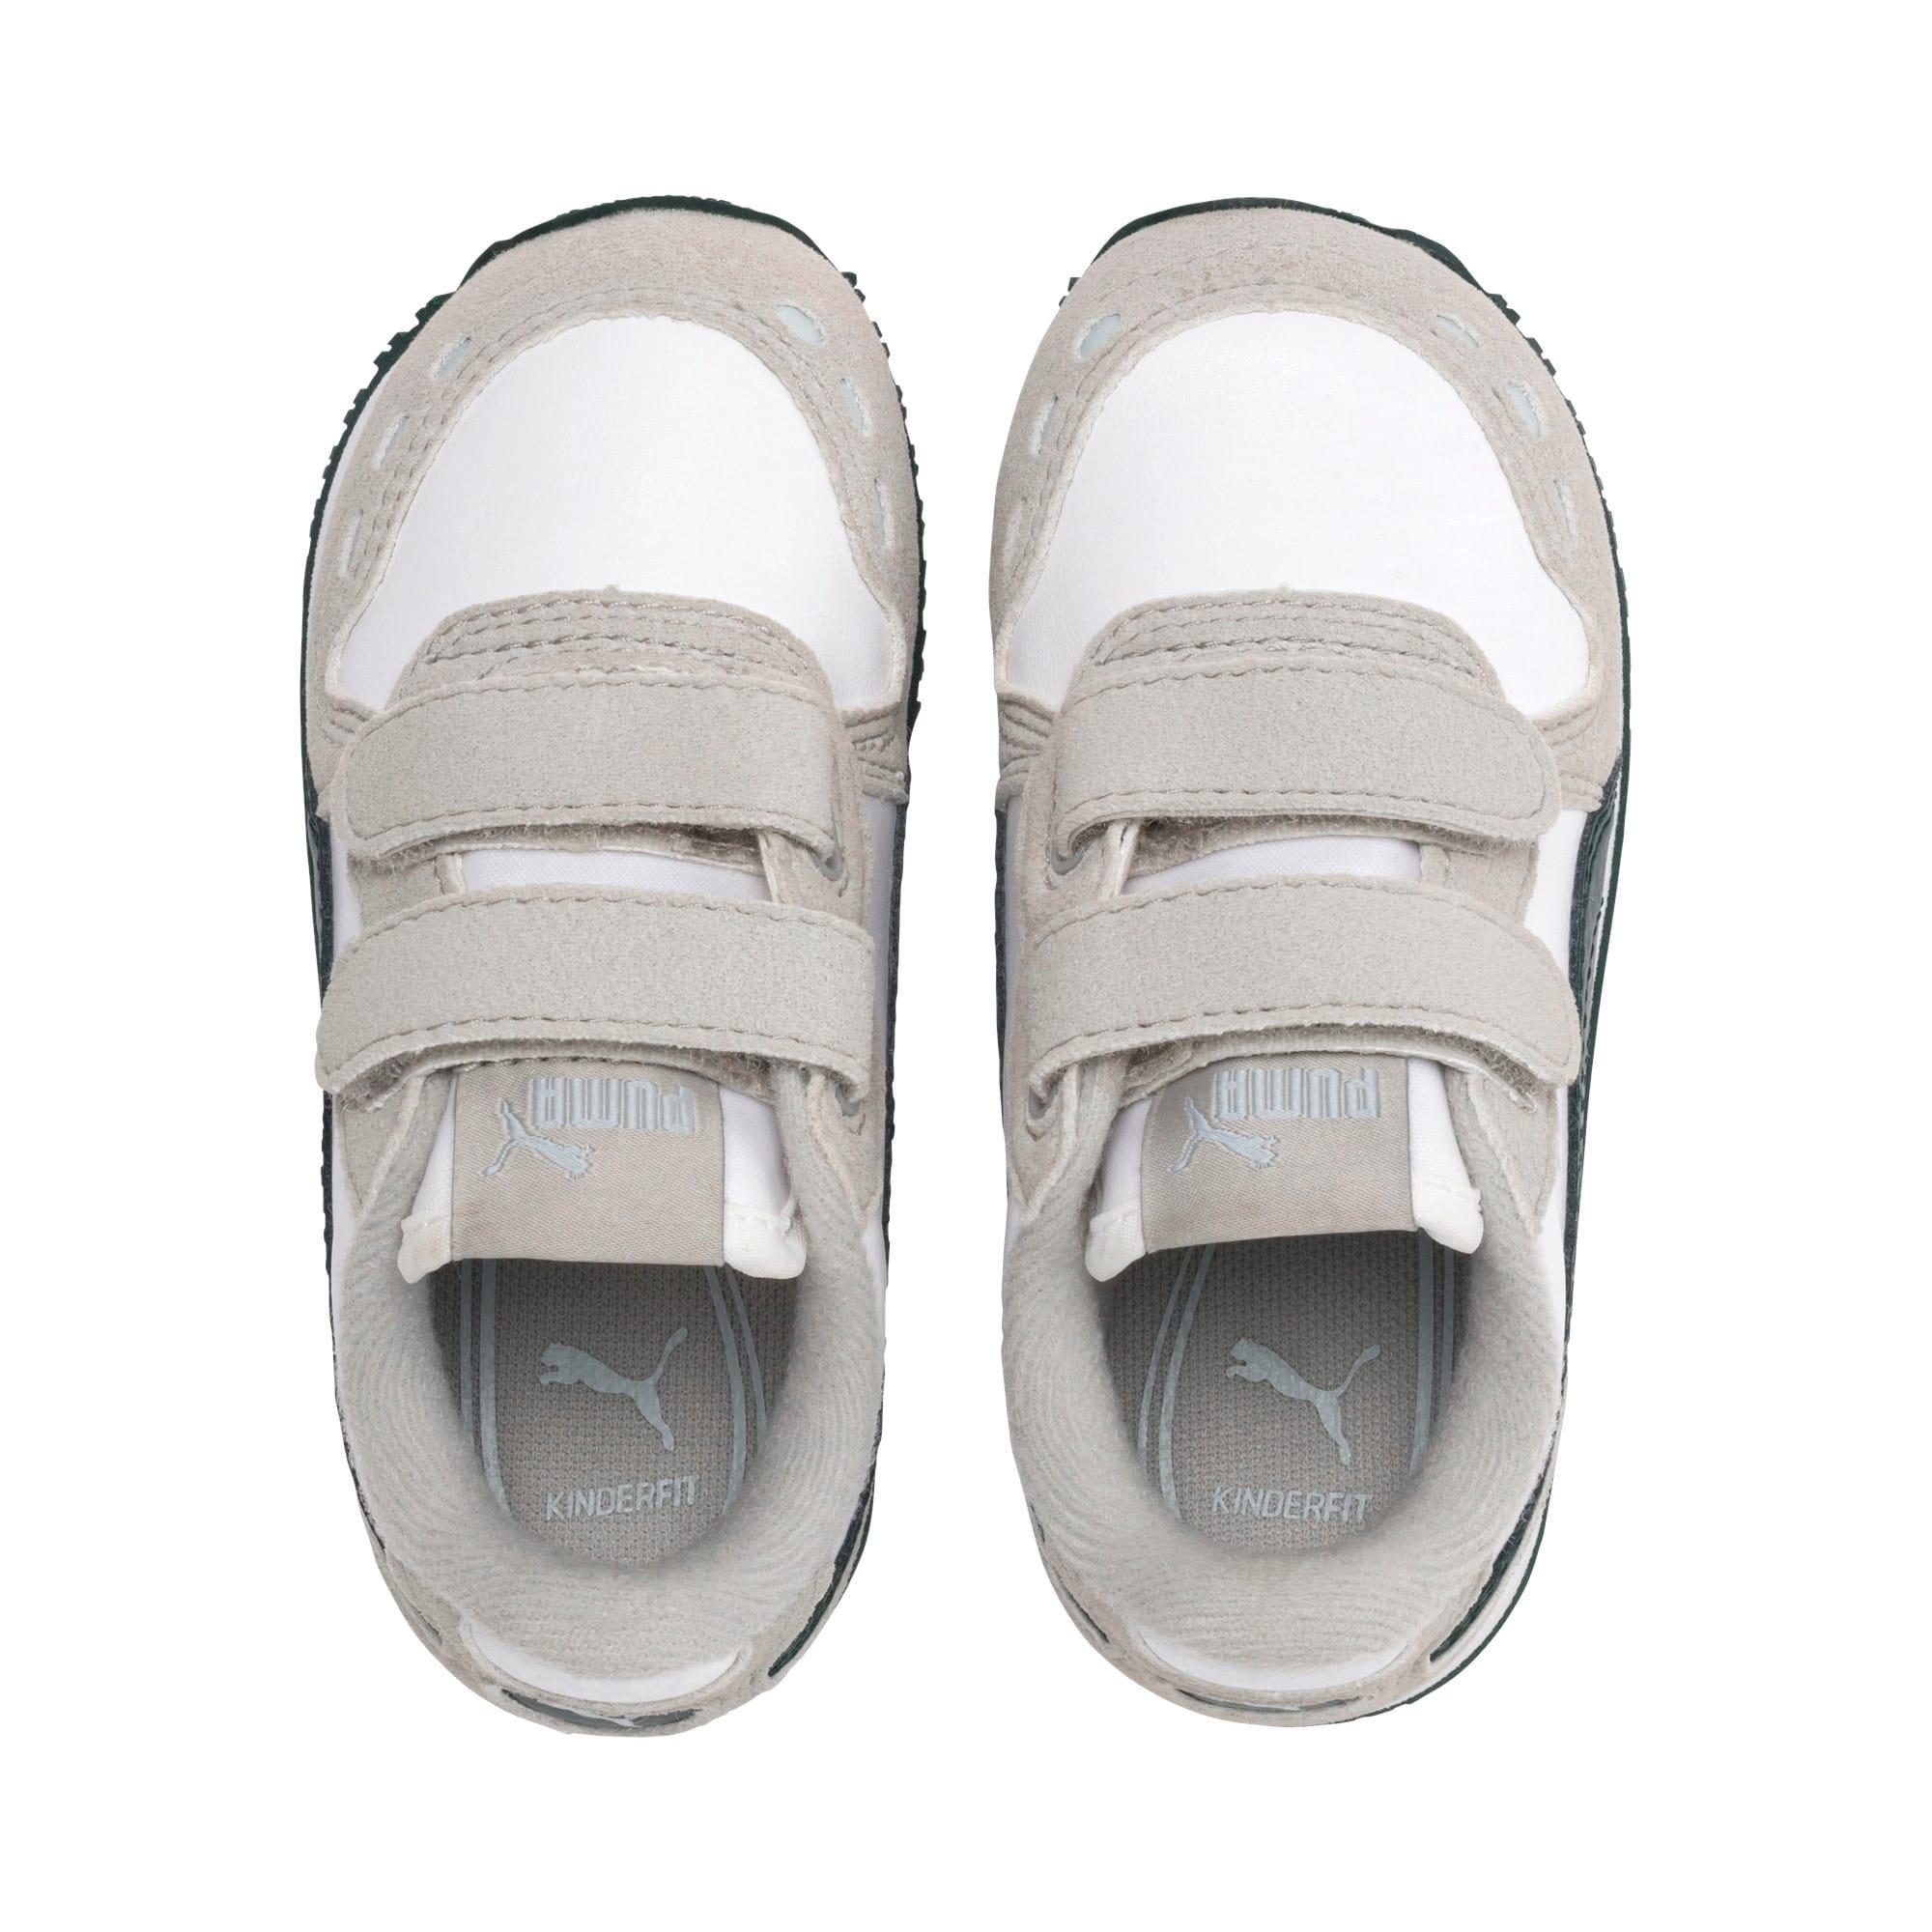 Thumbnail 6 of Cabana Racer SL AC Little Kids' Shoes, P.Wht-Gr.Violet-Ponder. Pine, medium